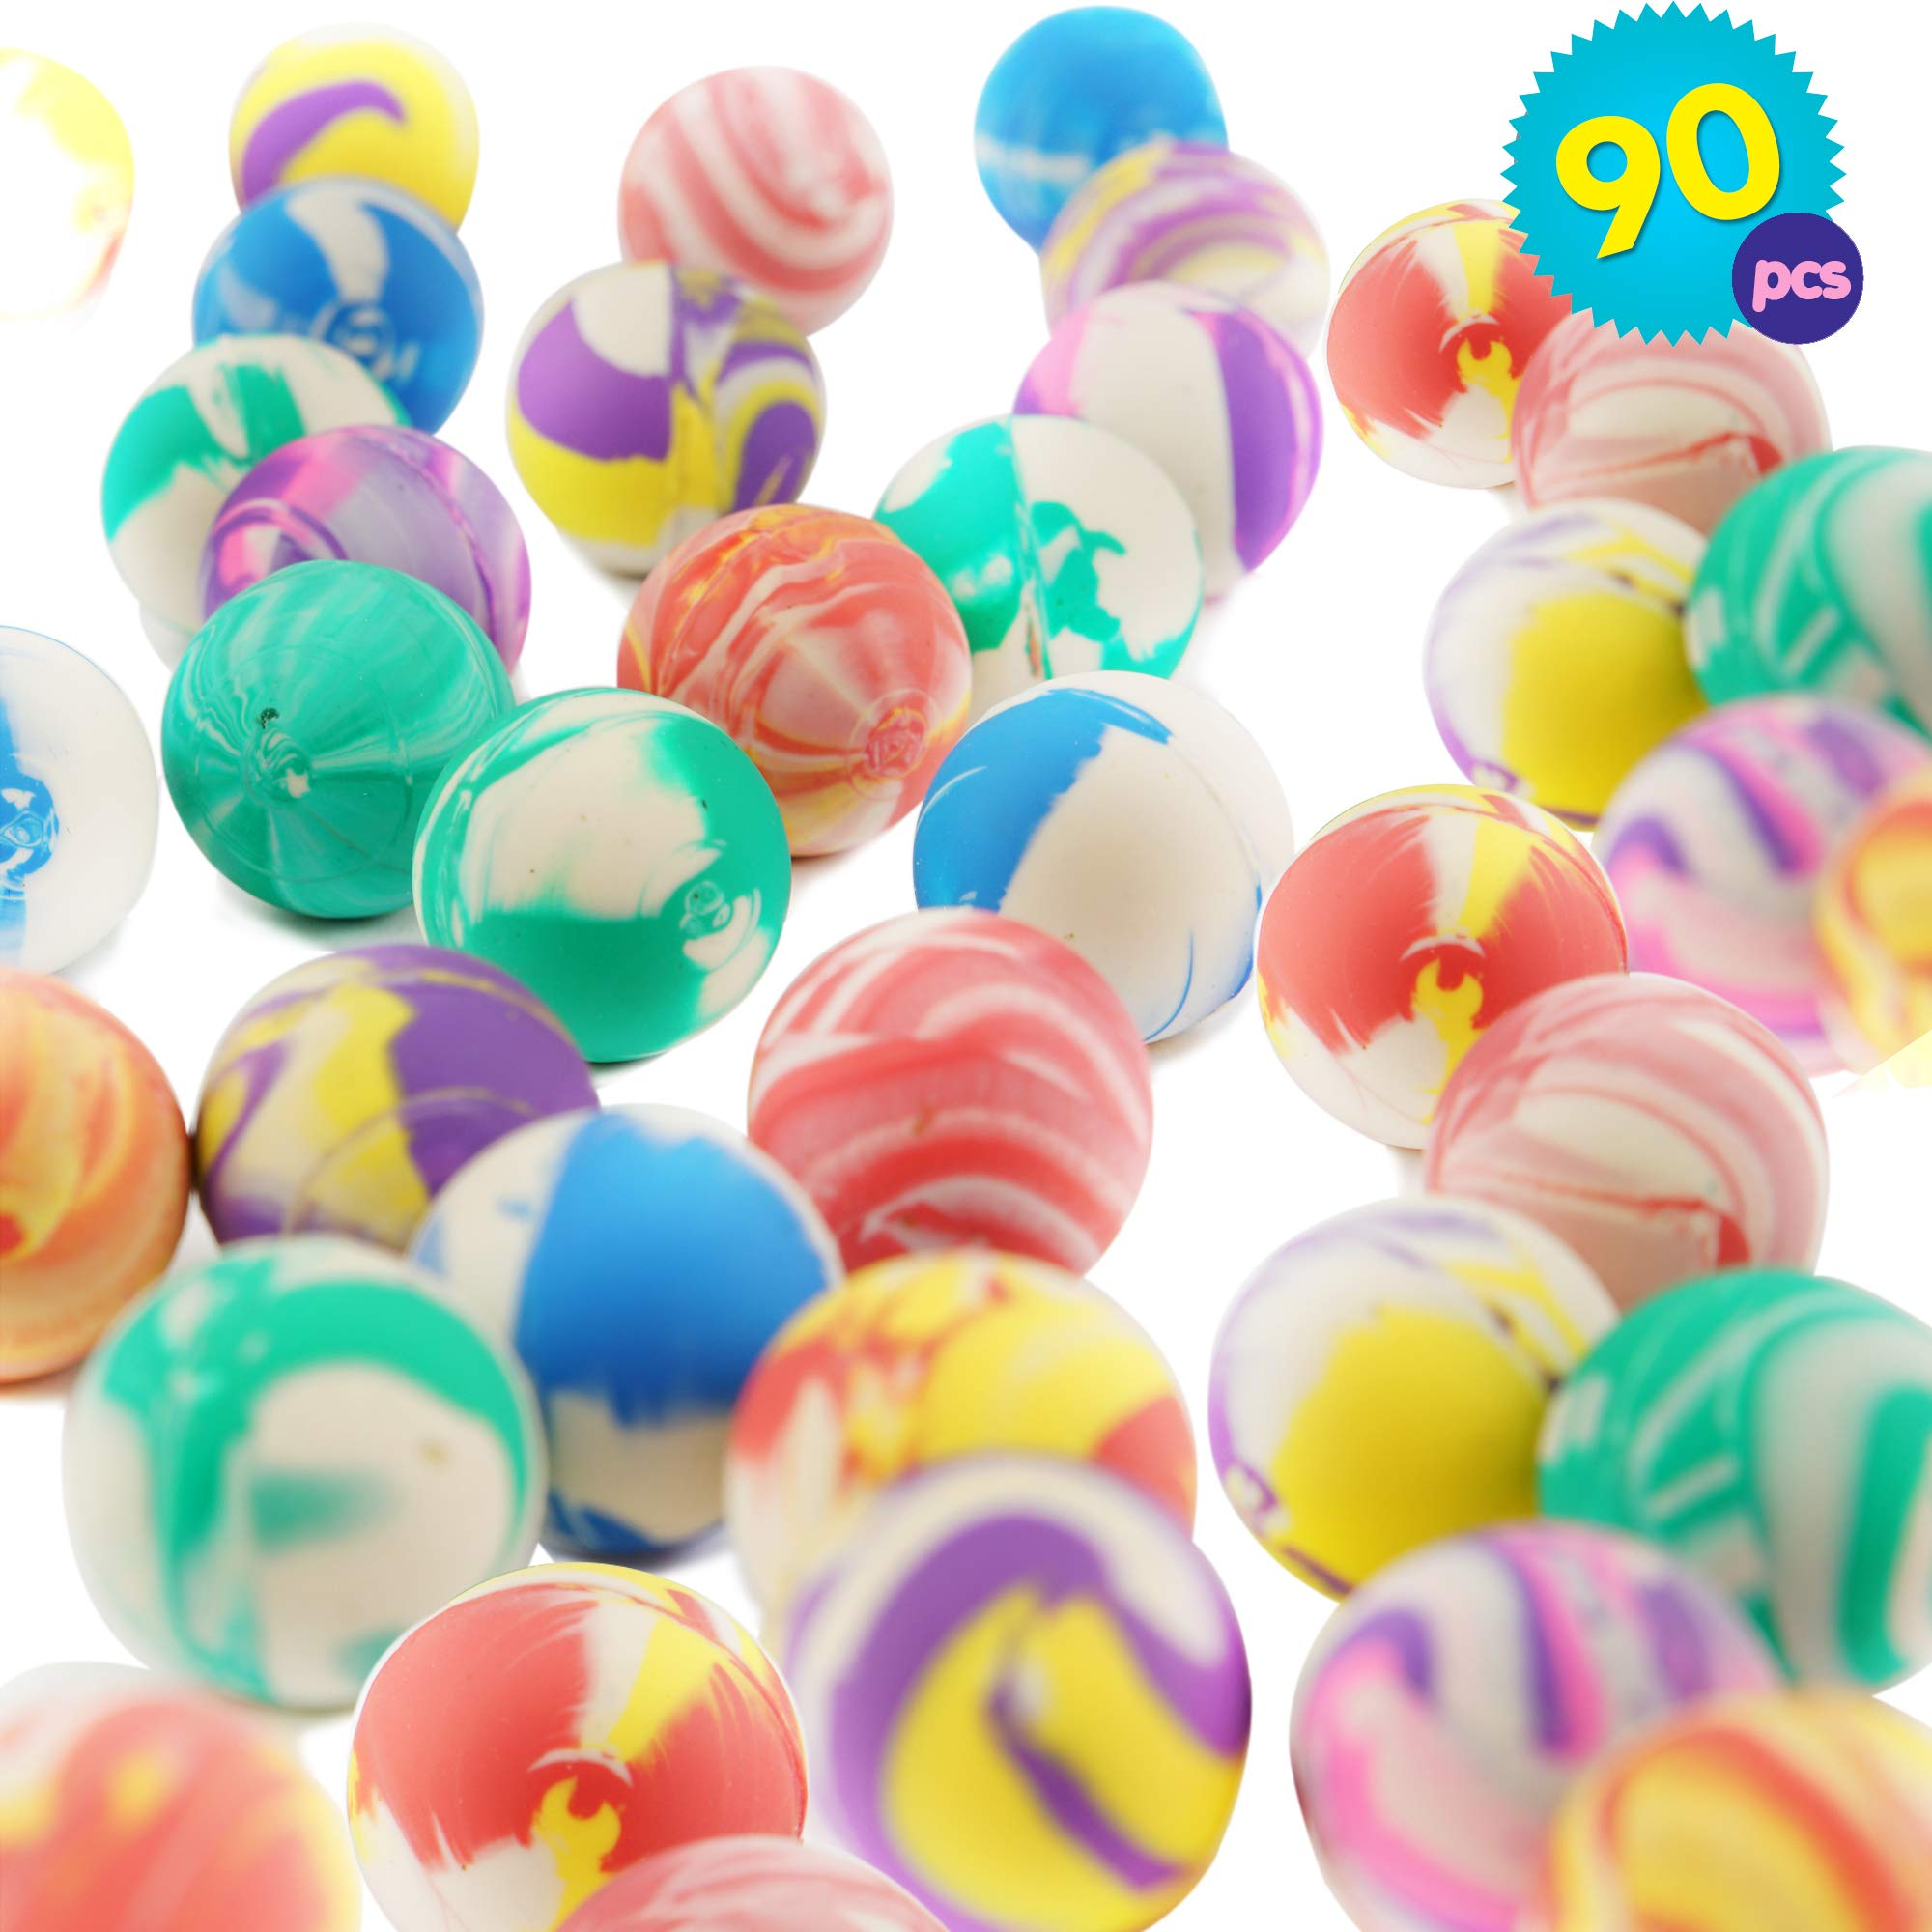 THE TWIDDLERS 90PCS Super Bouncy Balls Bulk   Assorted Multicolor High Bouncing Balls Toys   Bouncy Balls Toys for Kids   Party Bag Filler Balls   Birthday Party Favor Balls   Easter Party Favors Toys